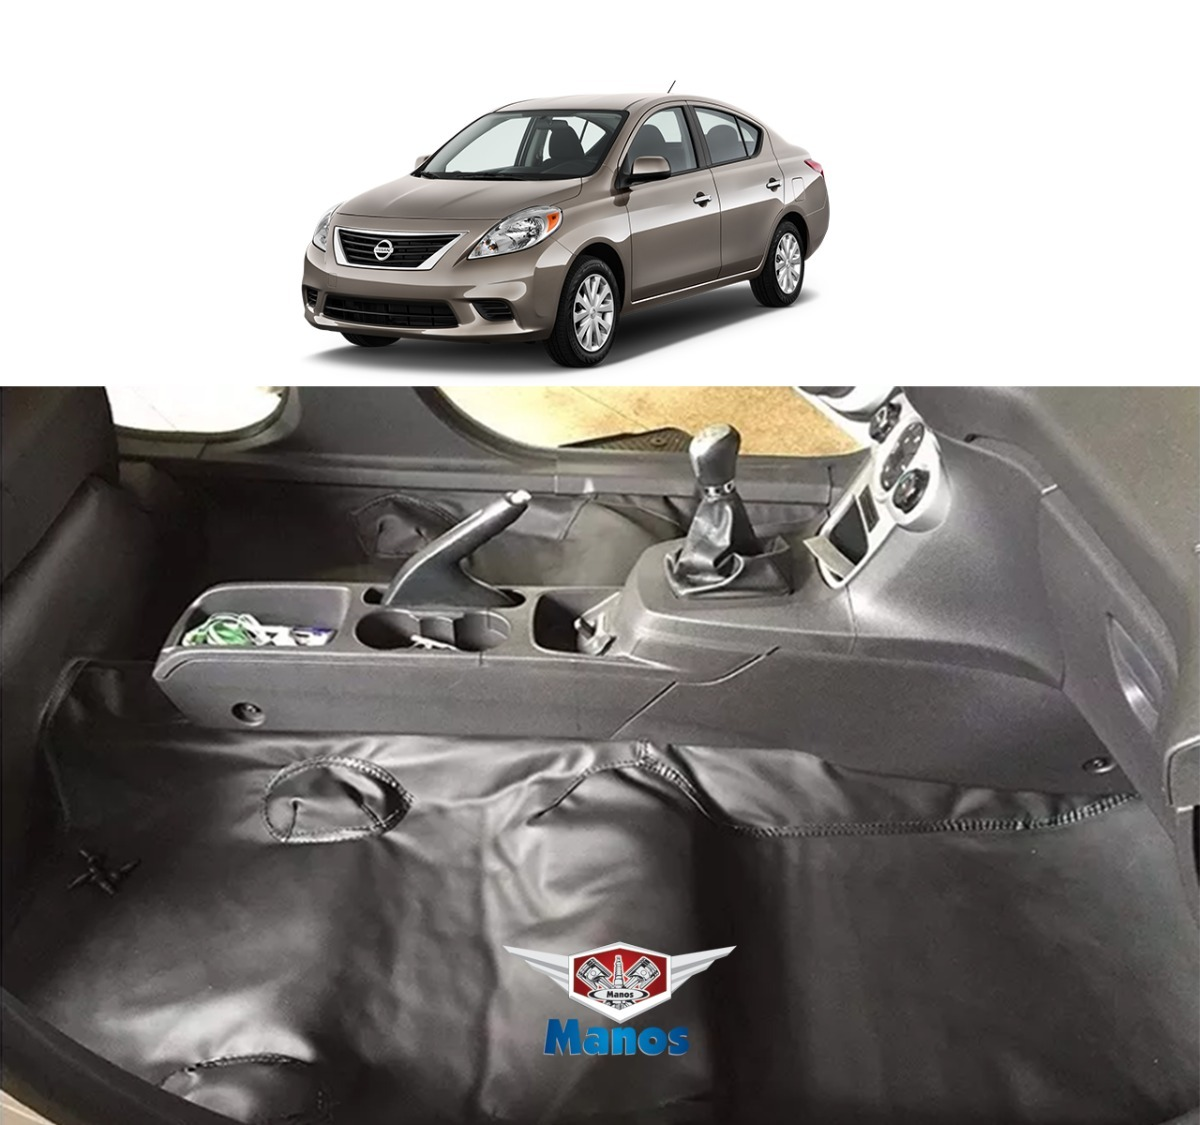 Tapete Carpete Nissan Versa C Mala Em Vinil Luxo Fosco R 295 80 Em Mercado Livre